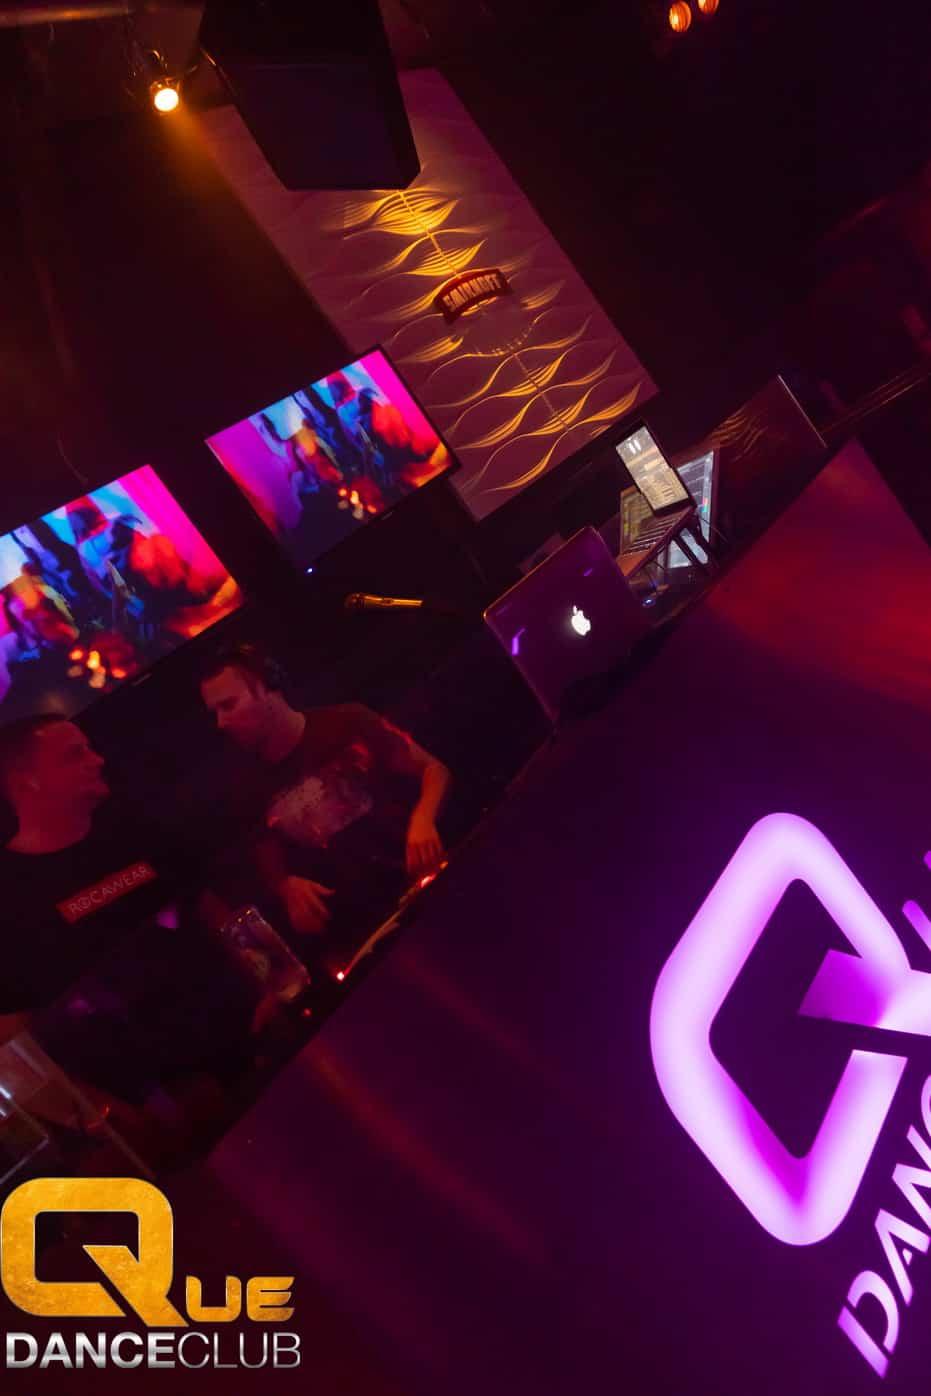 2018_11_23_Que_Danceclub_BLCK_FRDY_United_Nightlife_Scene_Timo_008